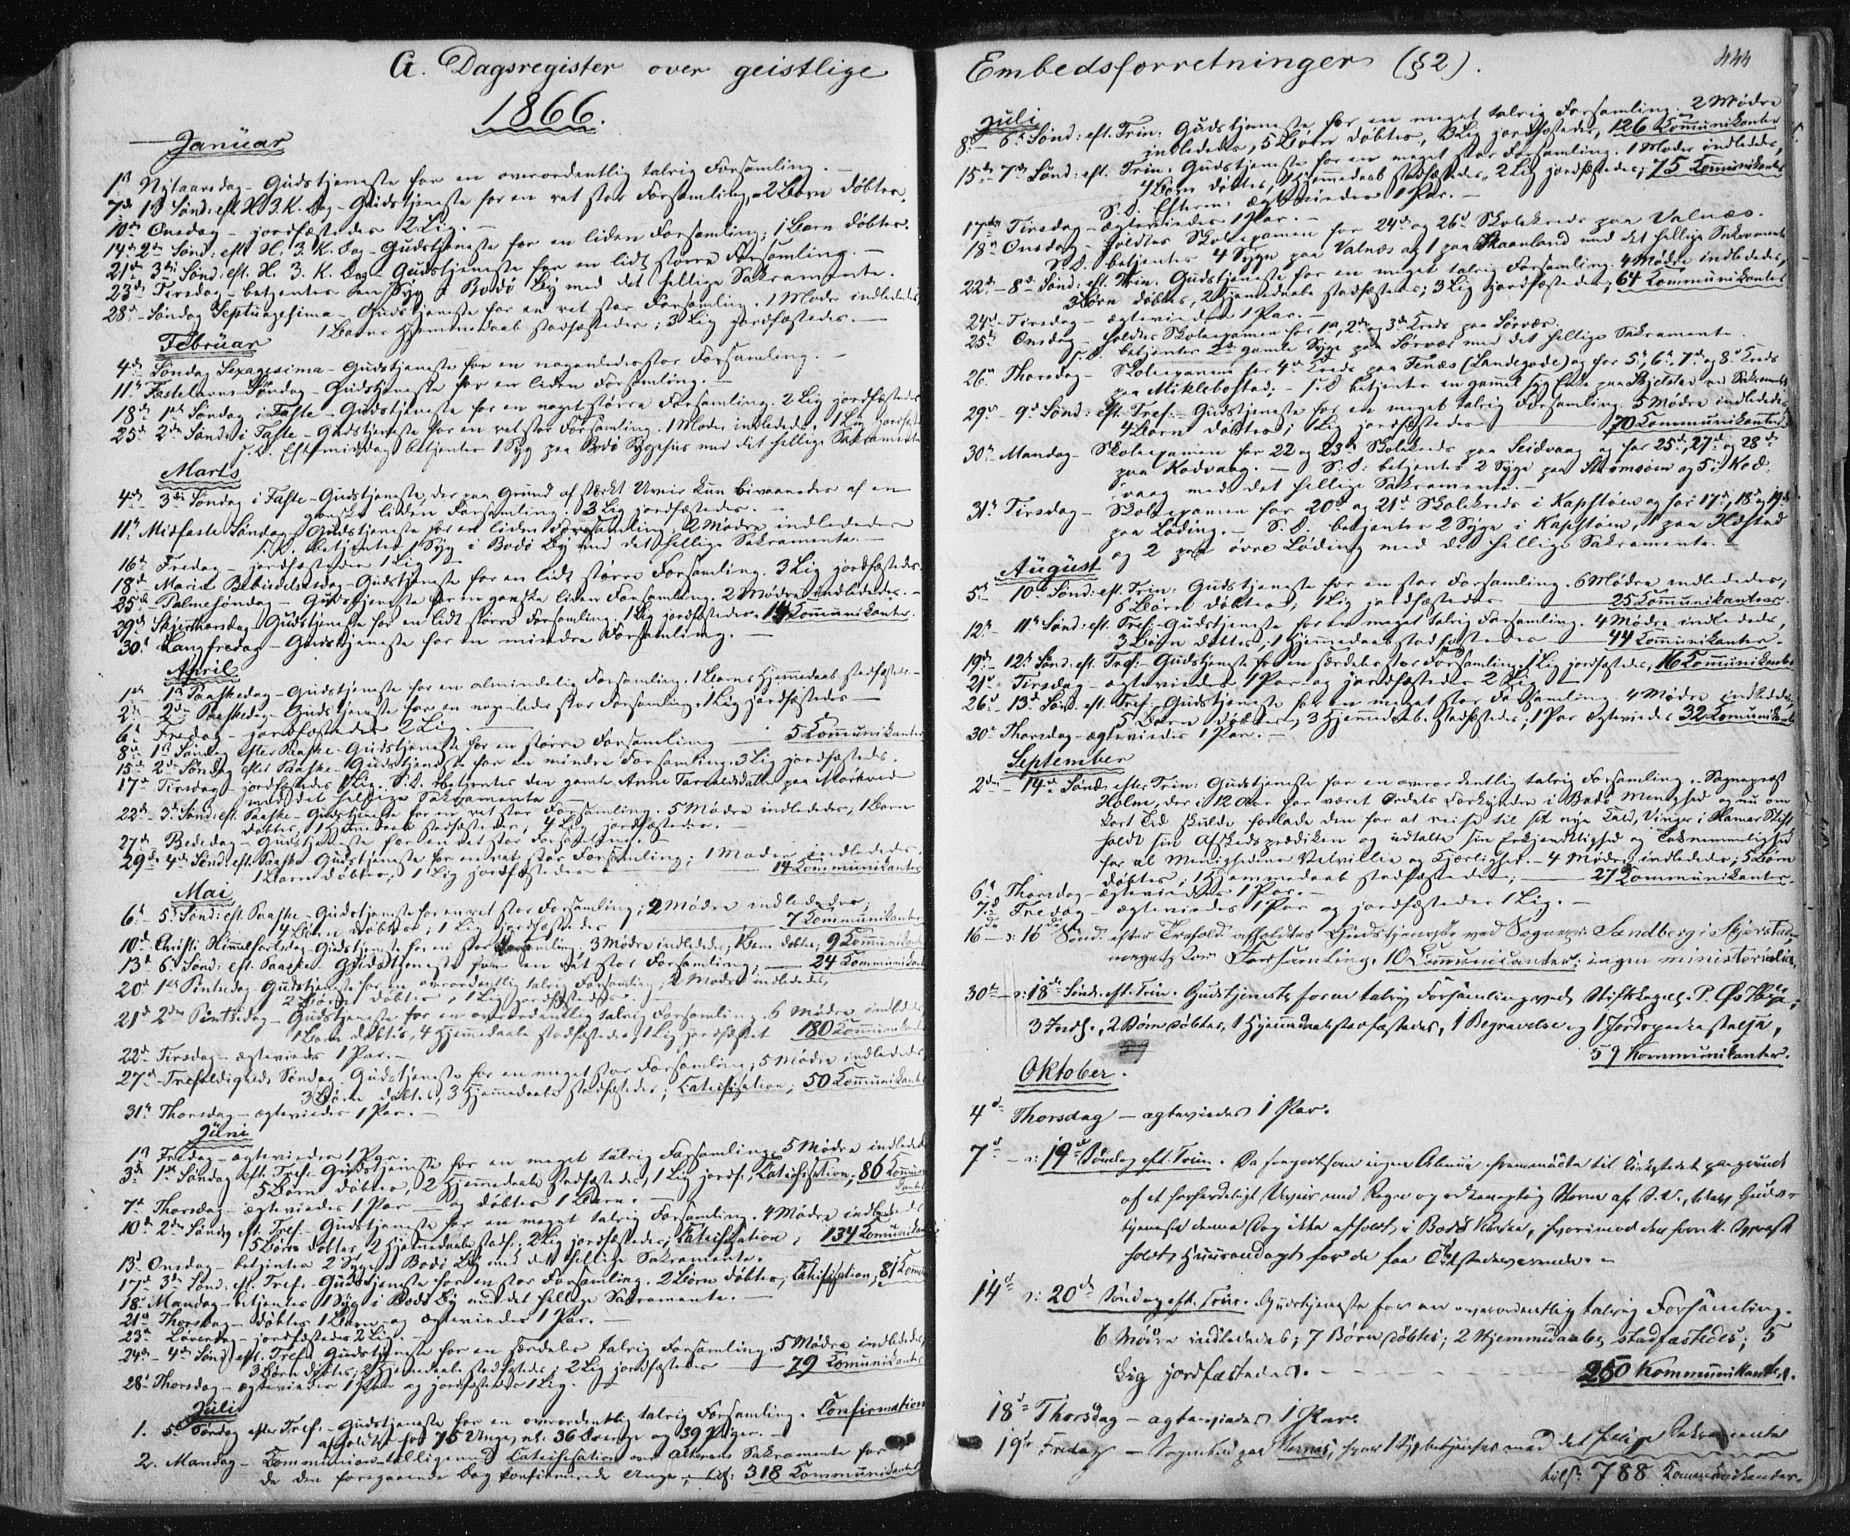 SAT, Ministerialprotokoller, klokkerbøker og fødselsregistre - Nordland, 801/L0008: Ministerialbok nr. 801A08, 1864-1875, s. 444